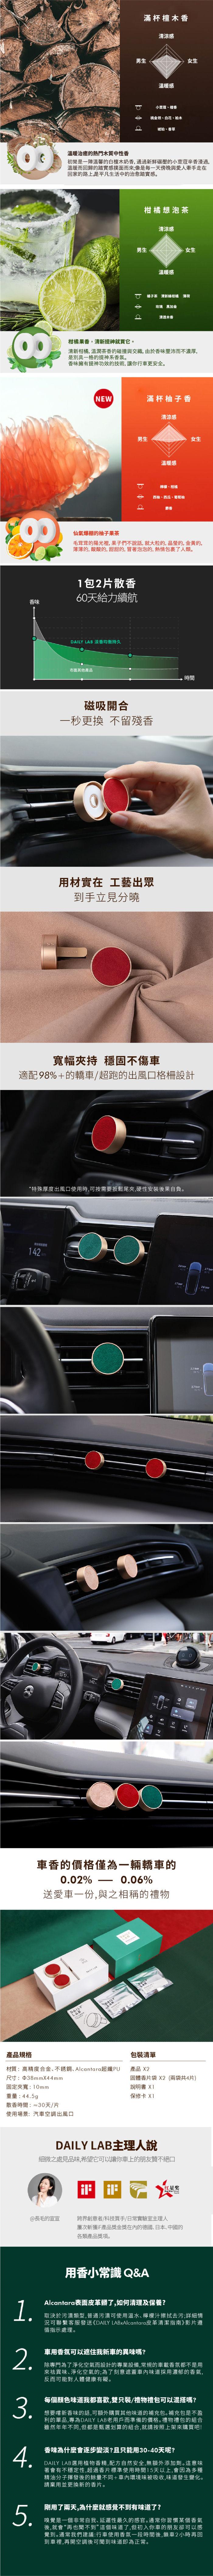 DAILY LAB|360° Alcantara 輕奢皮革款 車用香氛